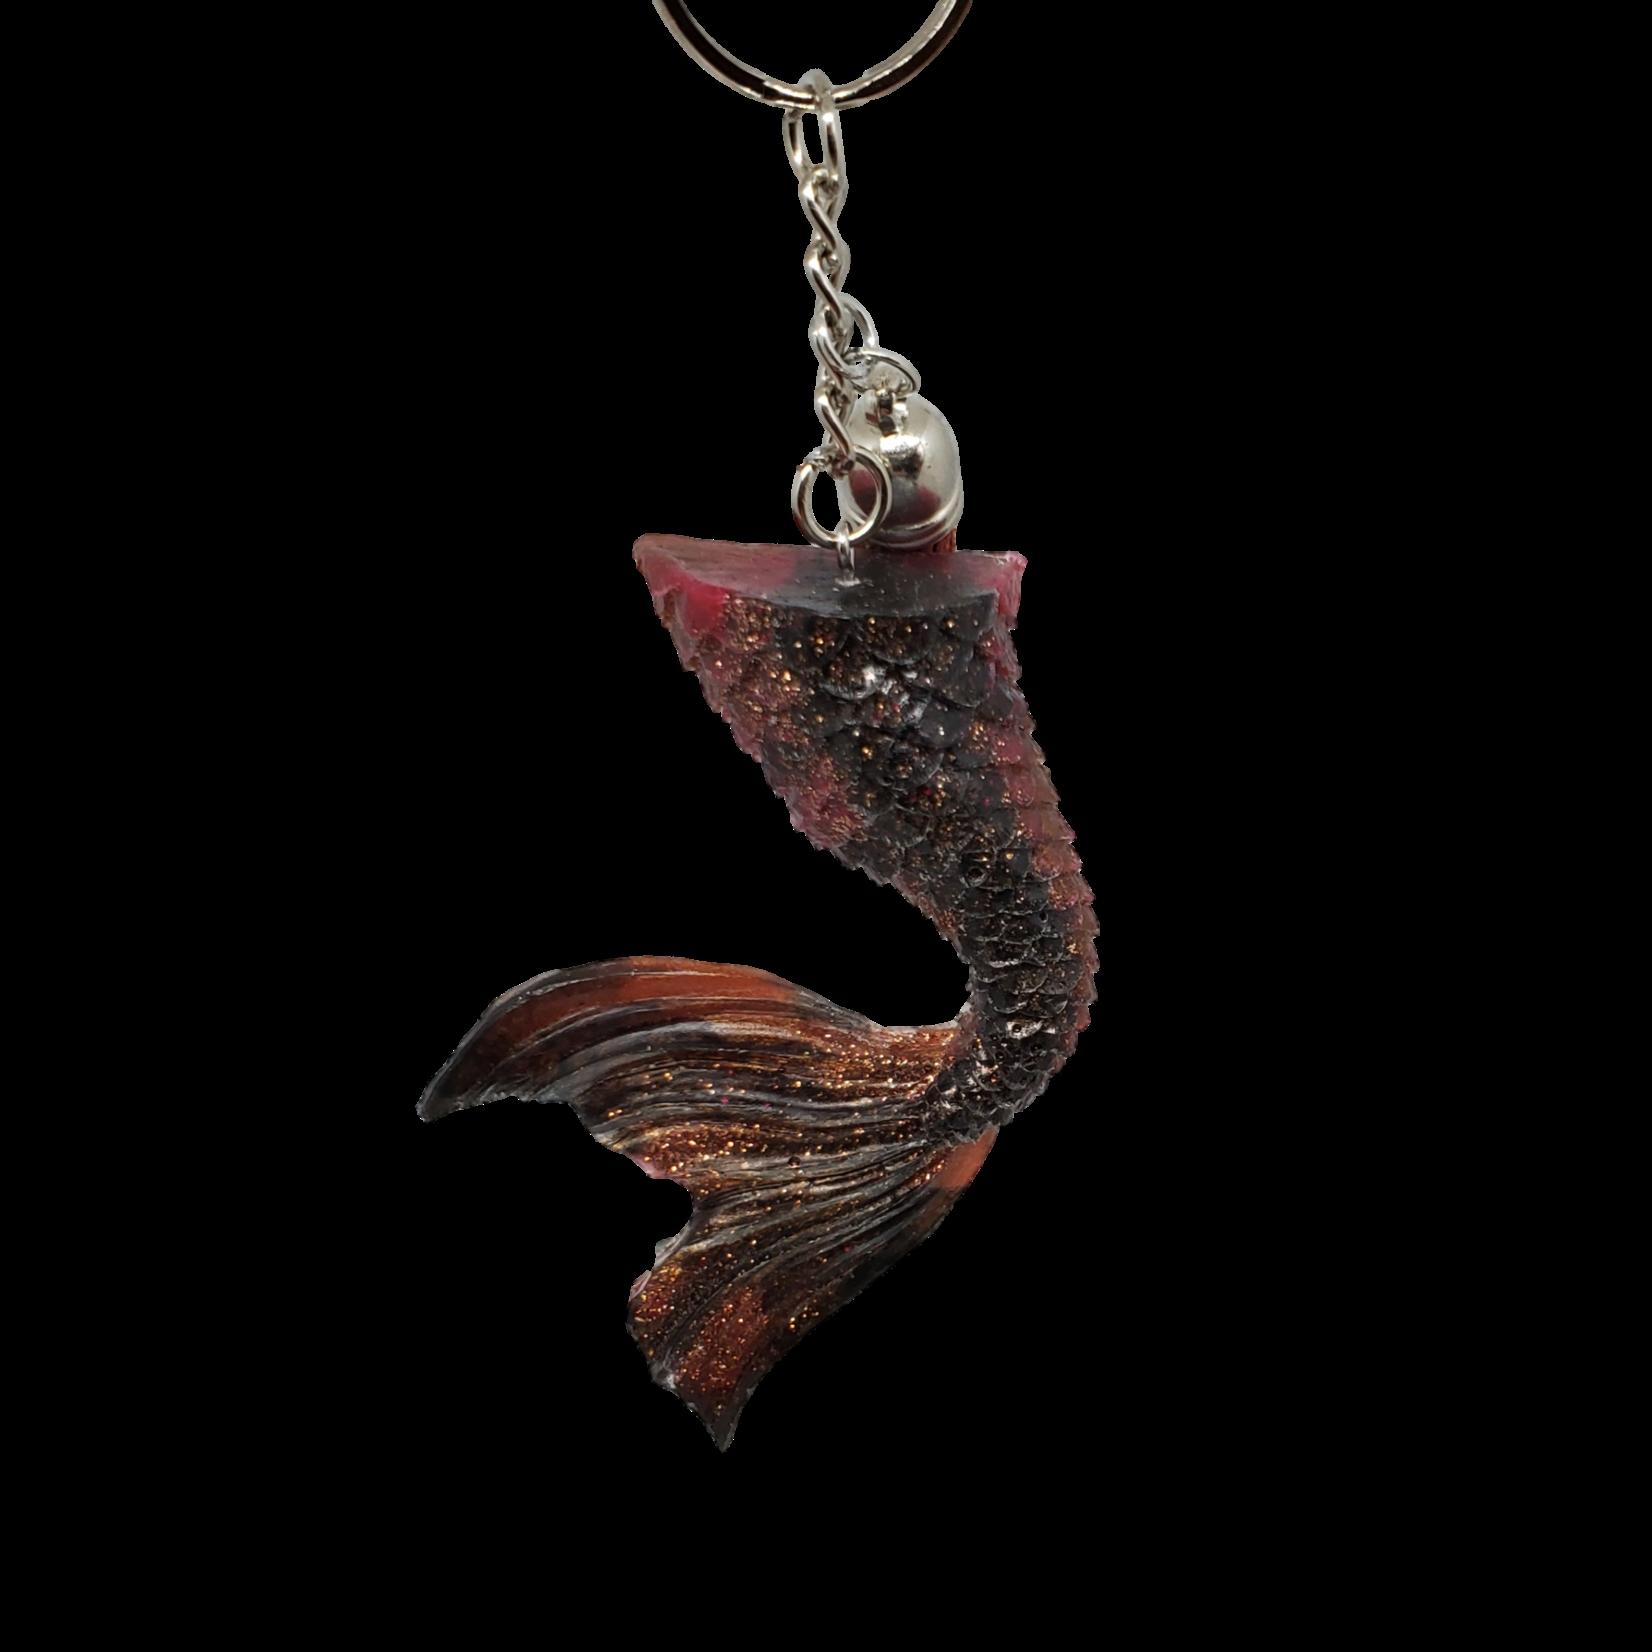 East Coast Sirens Black & Copper Glitter Mermaid Curved Tail Key Chain